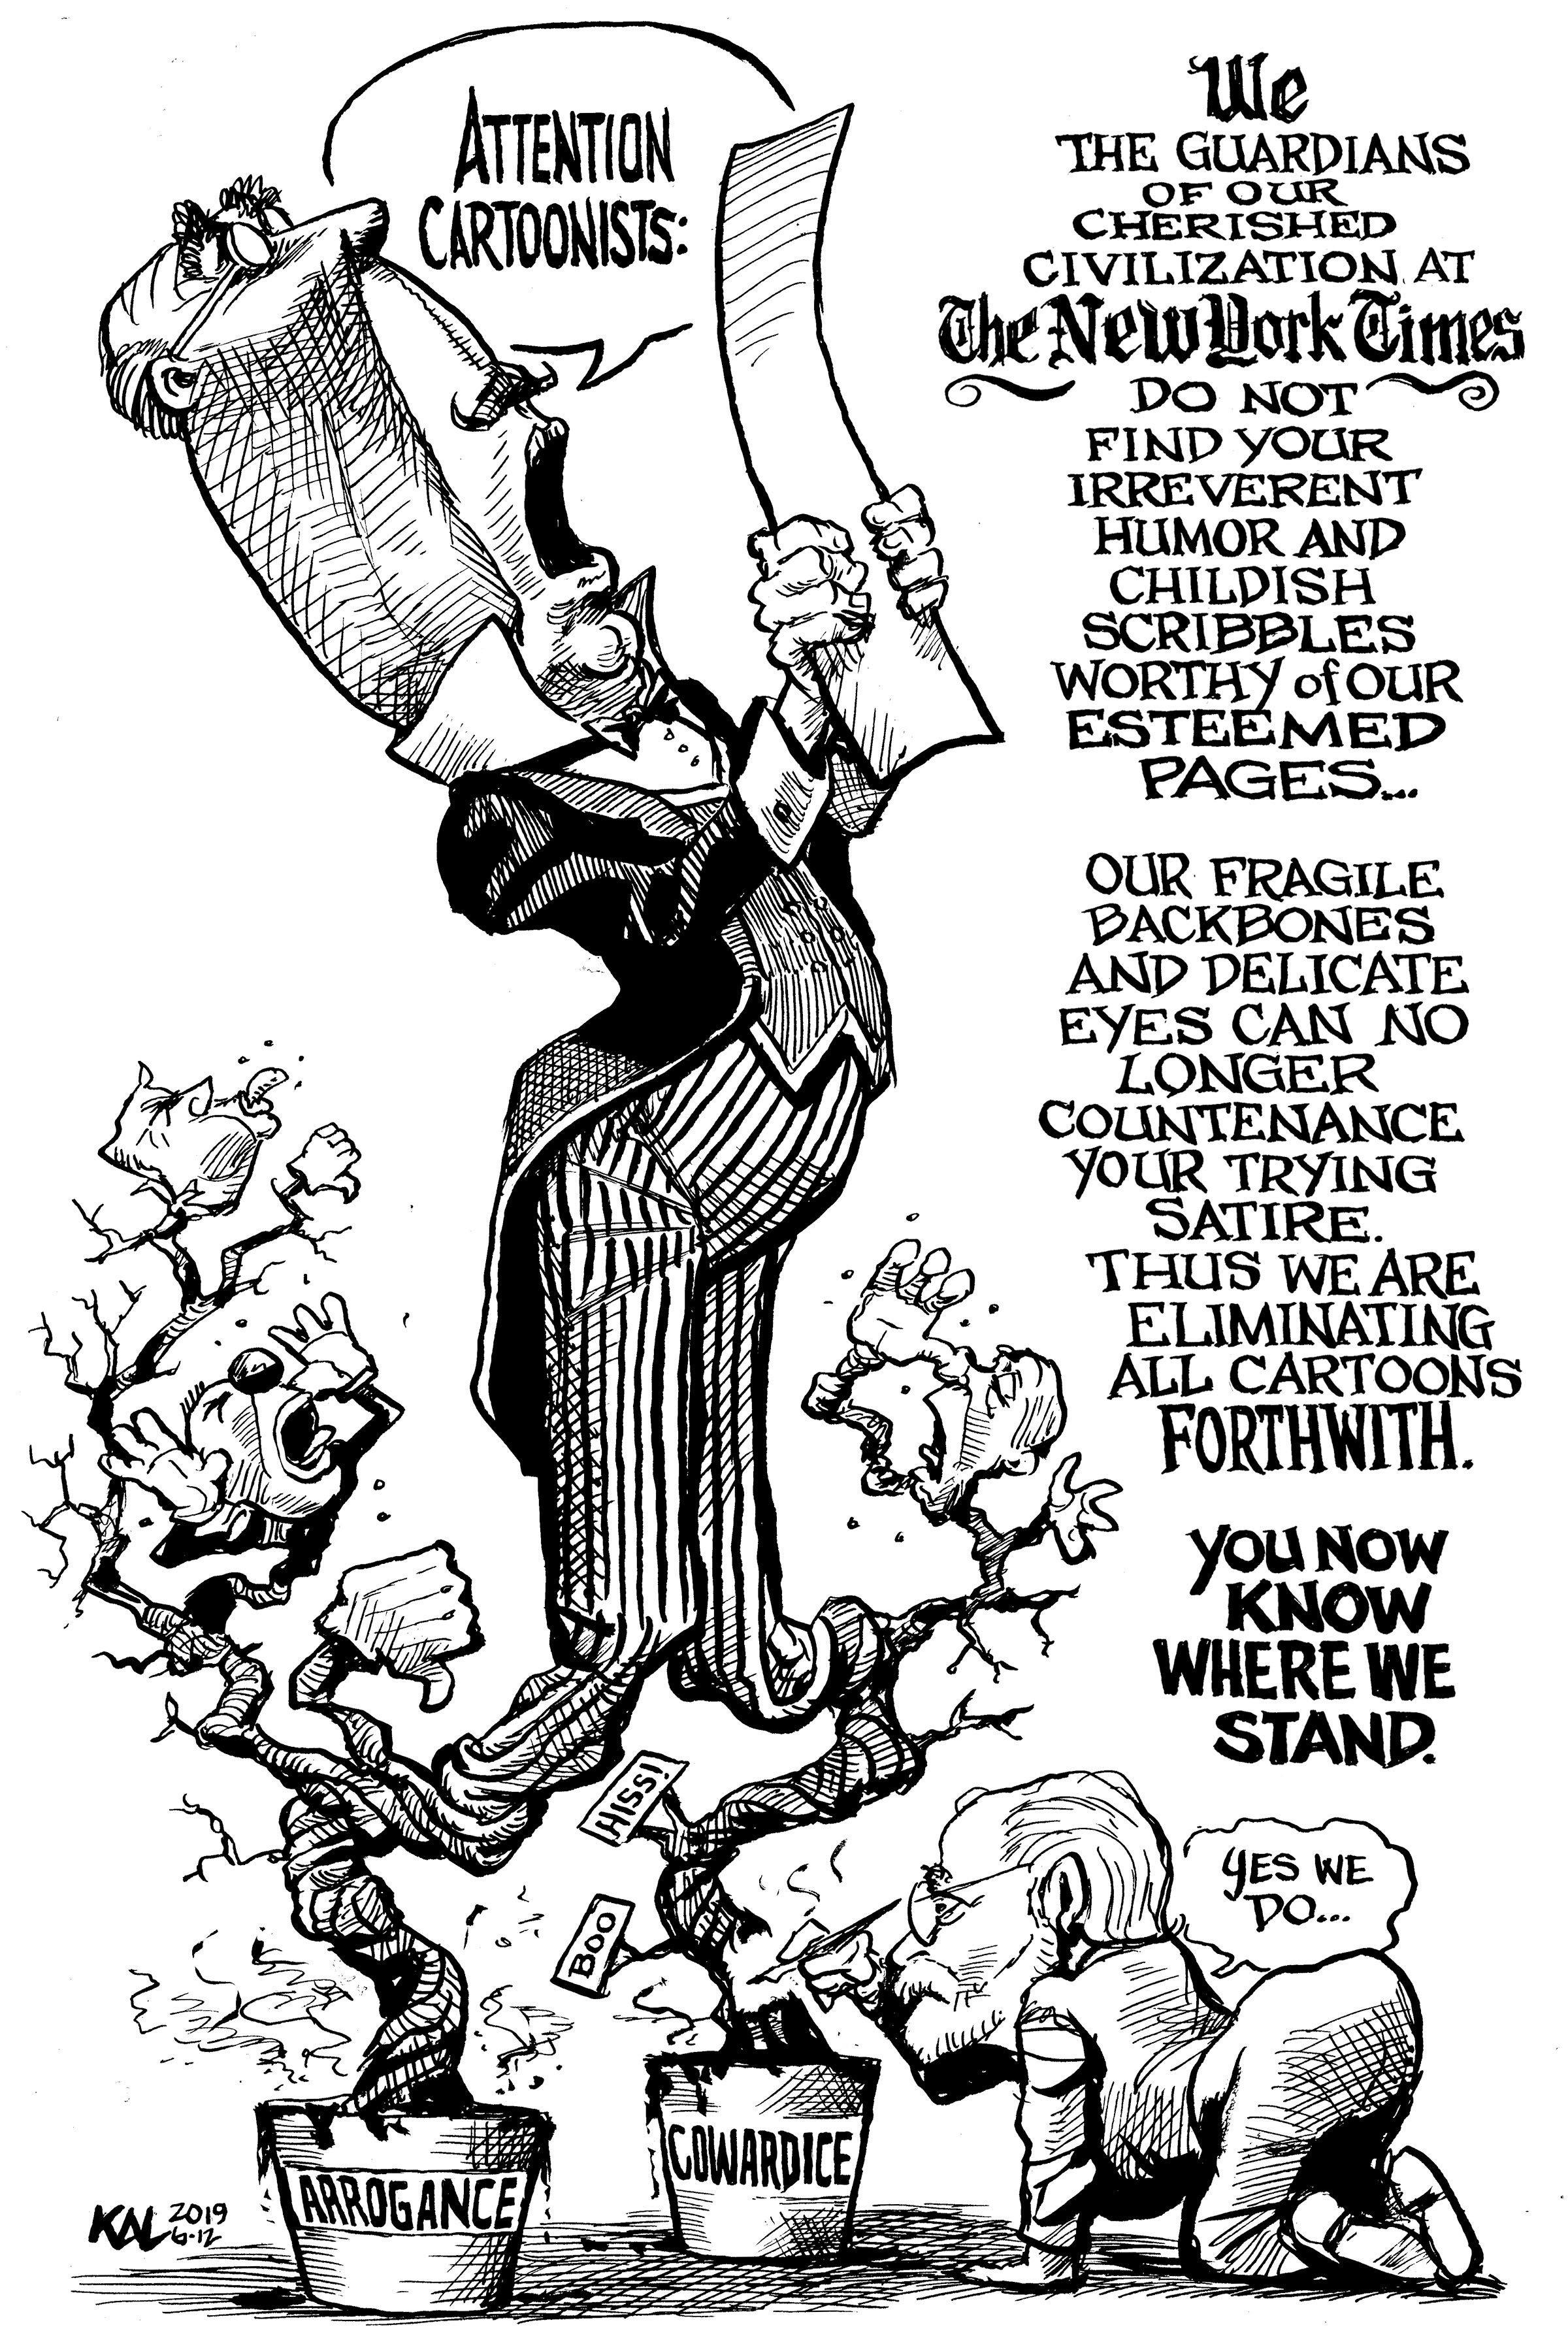 Cartoonists React To New York Times Cartoon Ban The Daily Cartoonist